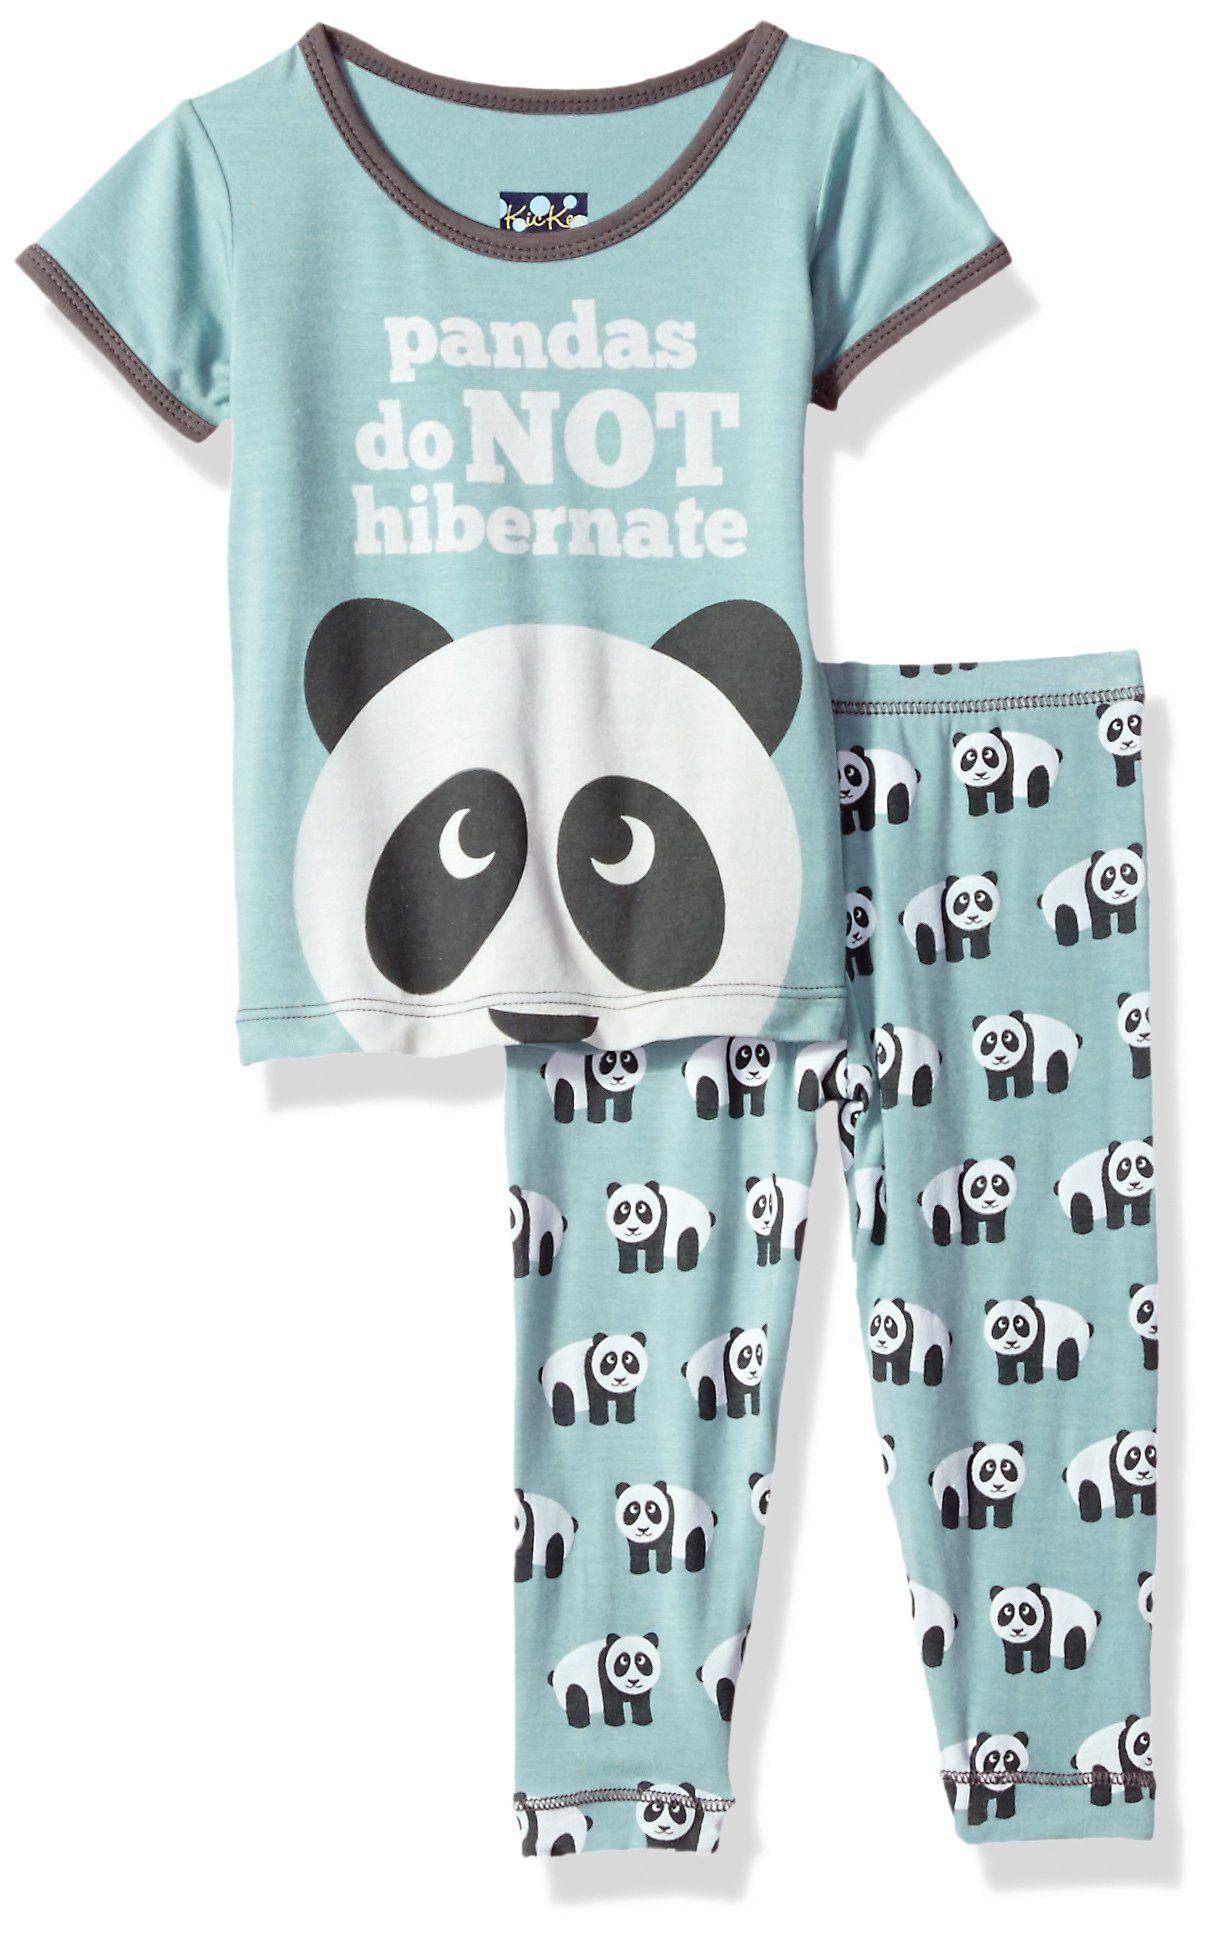 Kickee Pants Baby Boys Print Short Sleeve Pajama Set Prd-kppj108-gfm